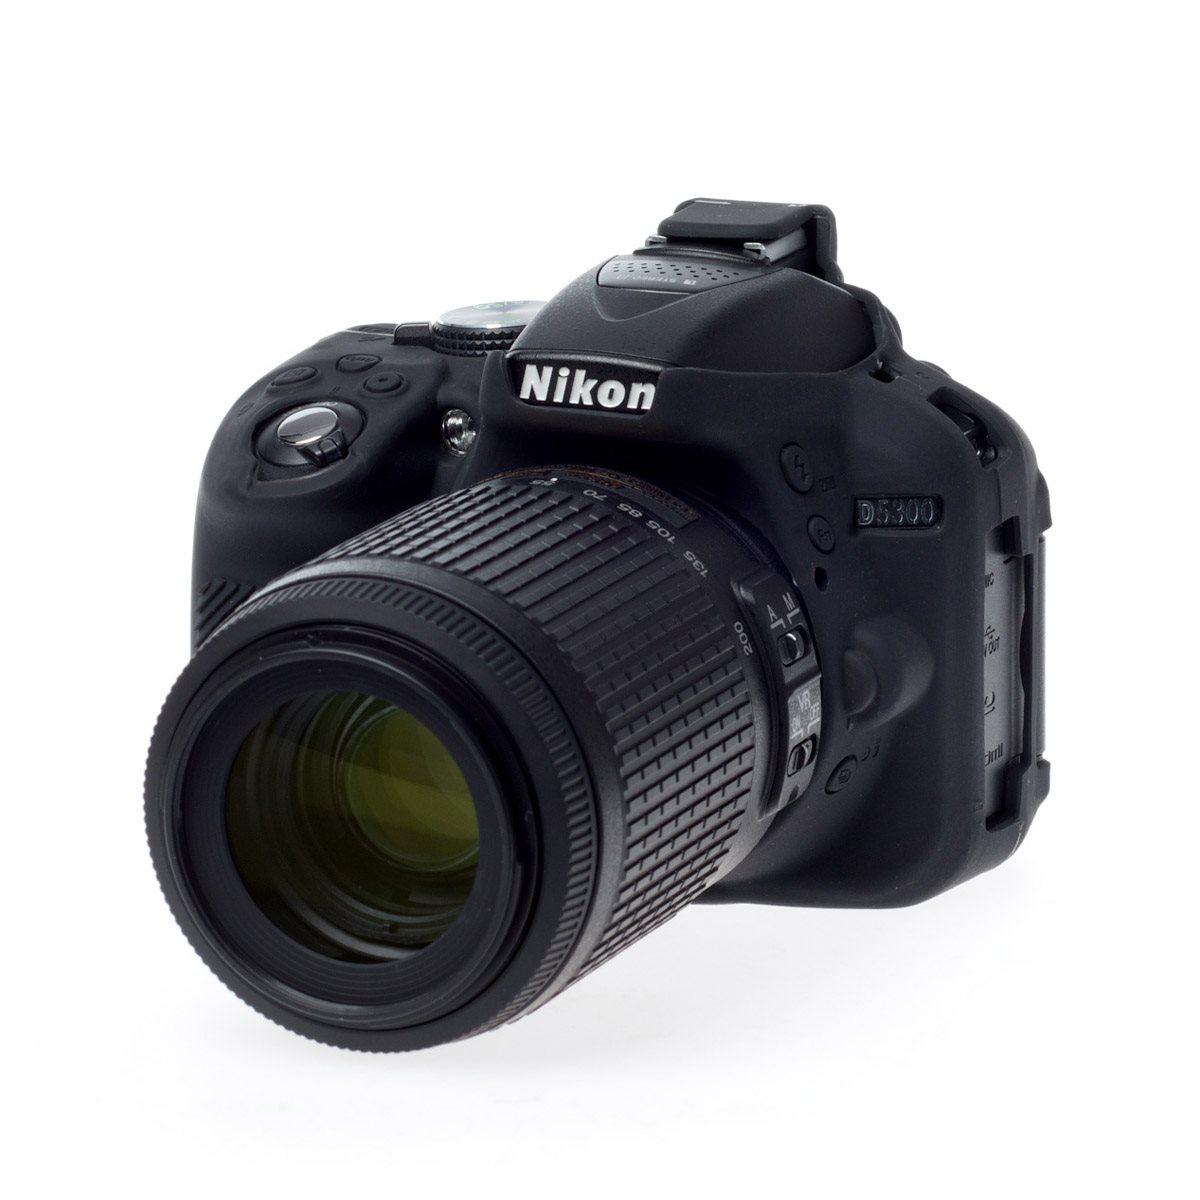 Easy Cover Reflex Silic Nikon D5300 Black